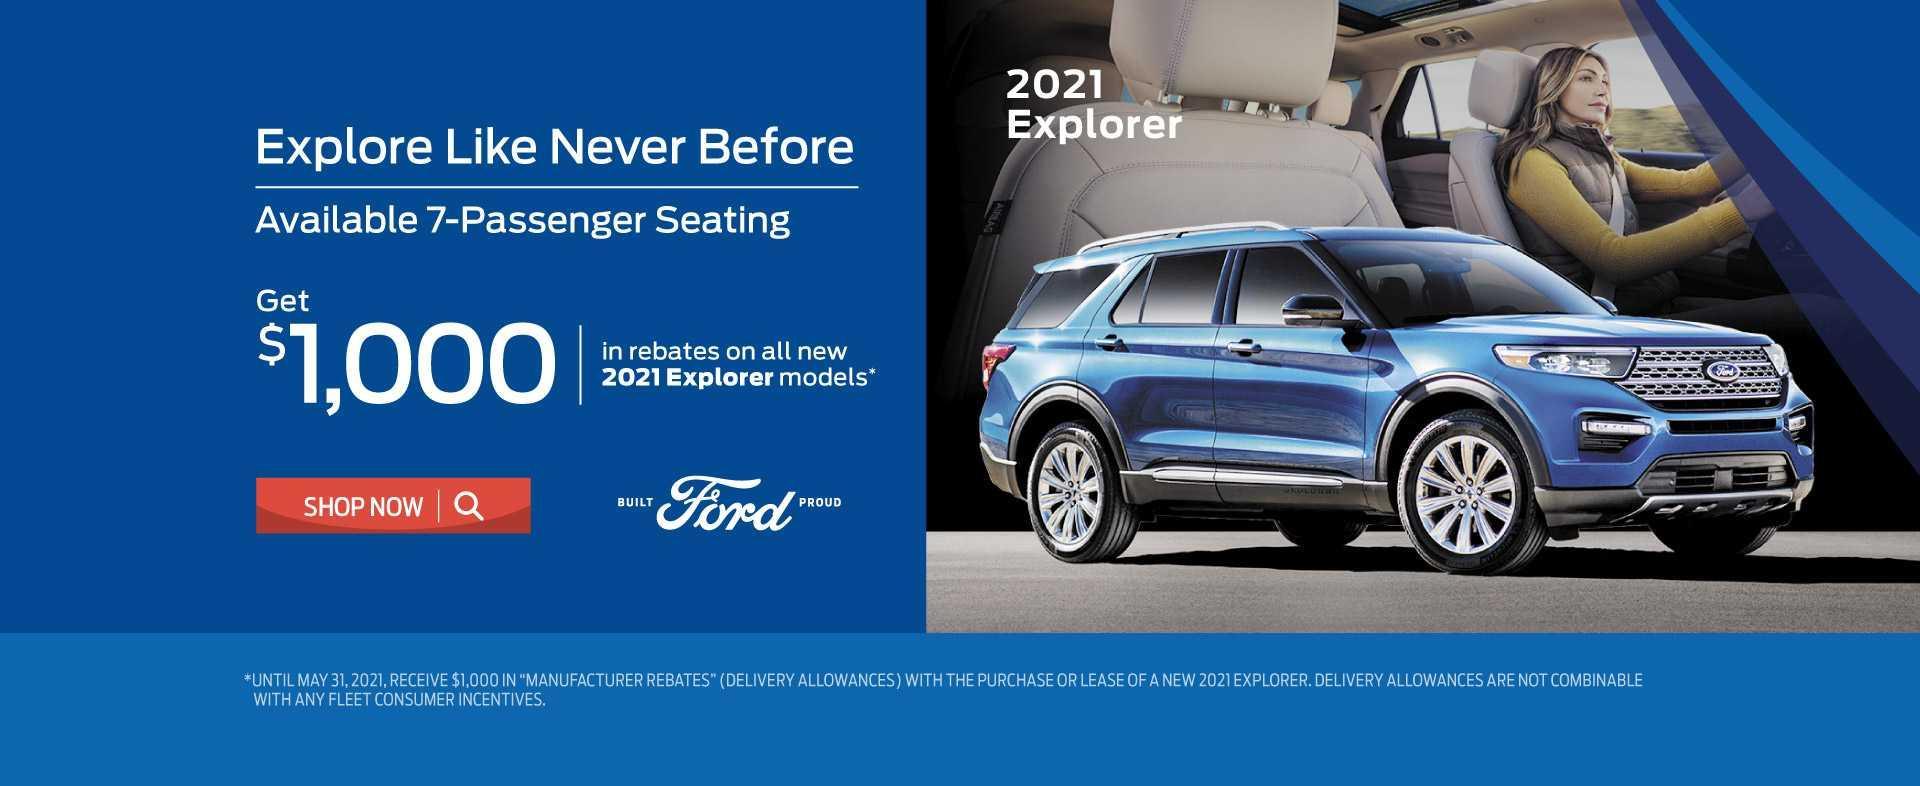 2021 Explorer